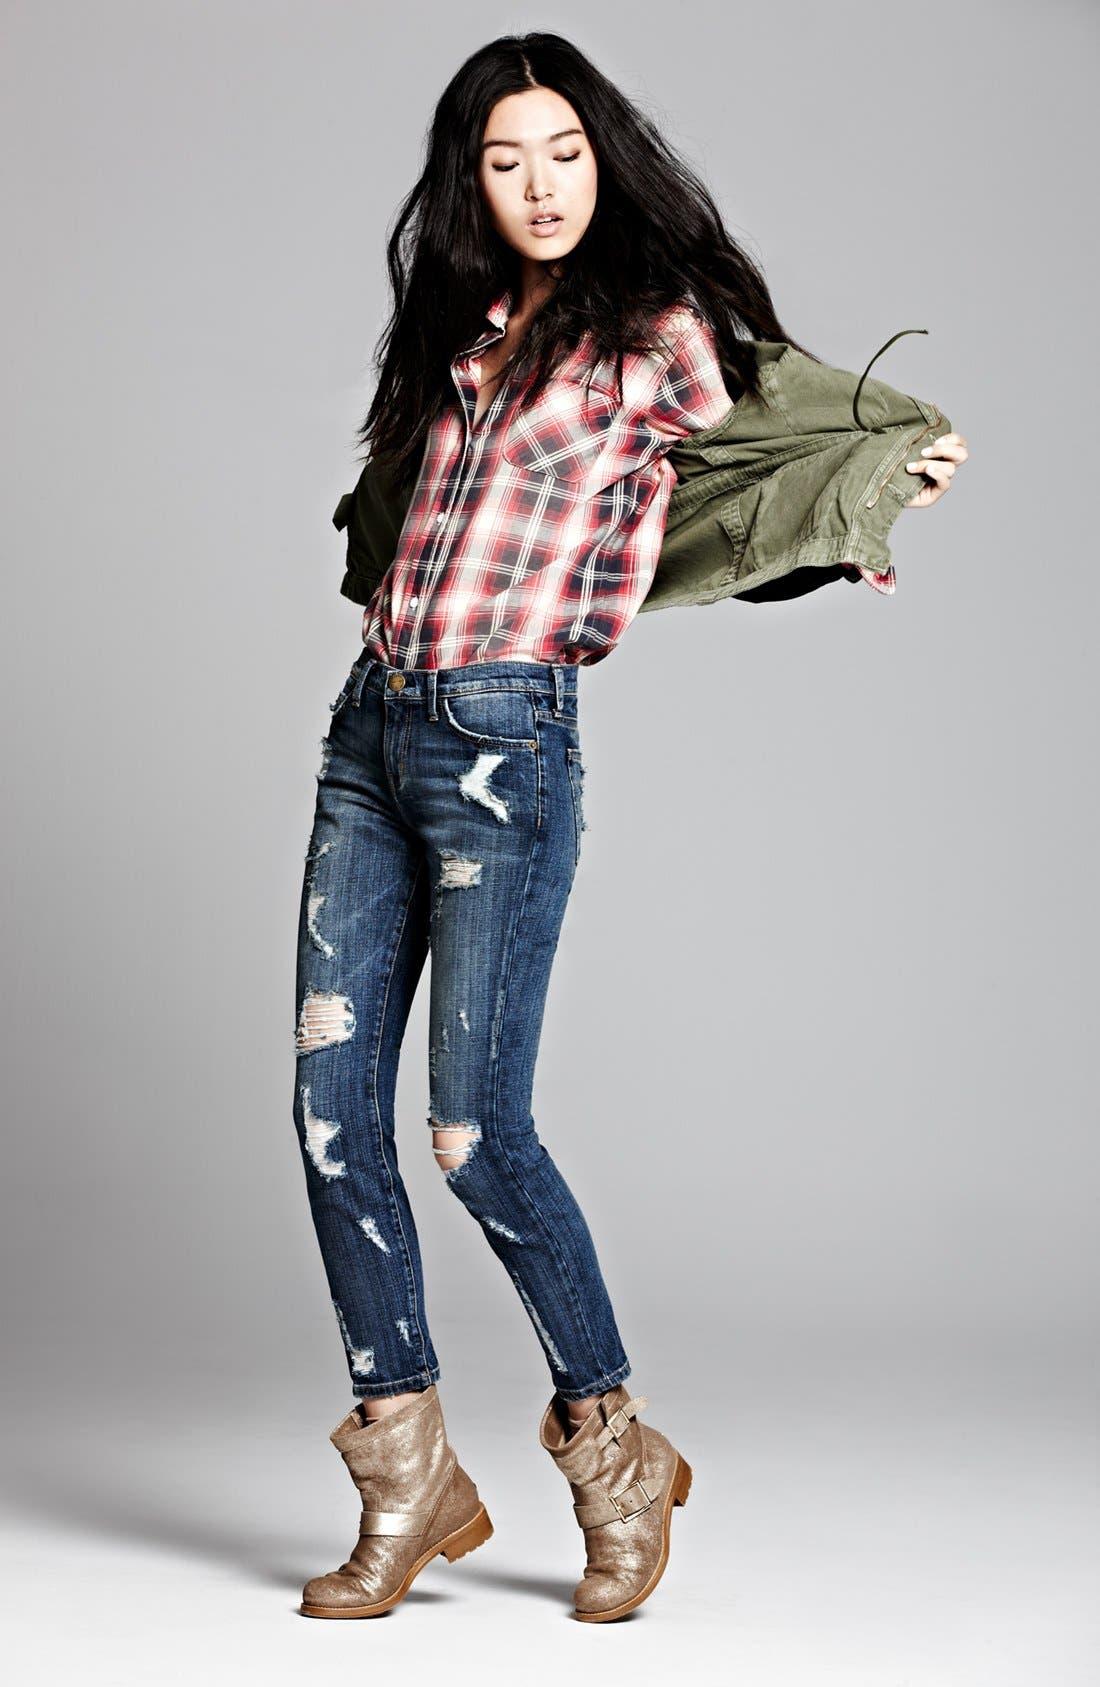 Main Image - Current/Elliott Jacket, Shirt & Jeans